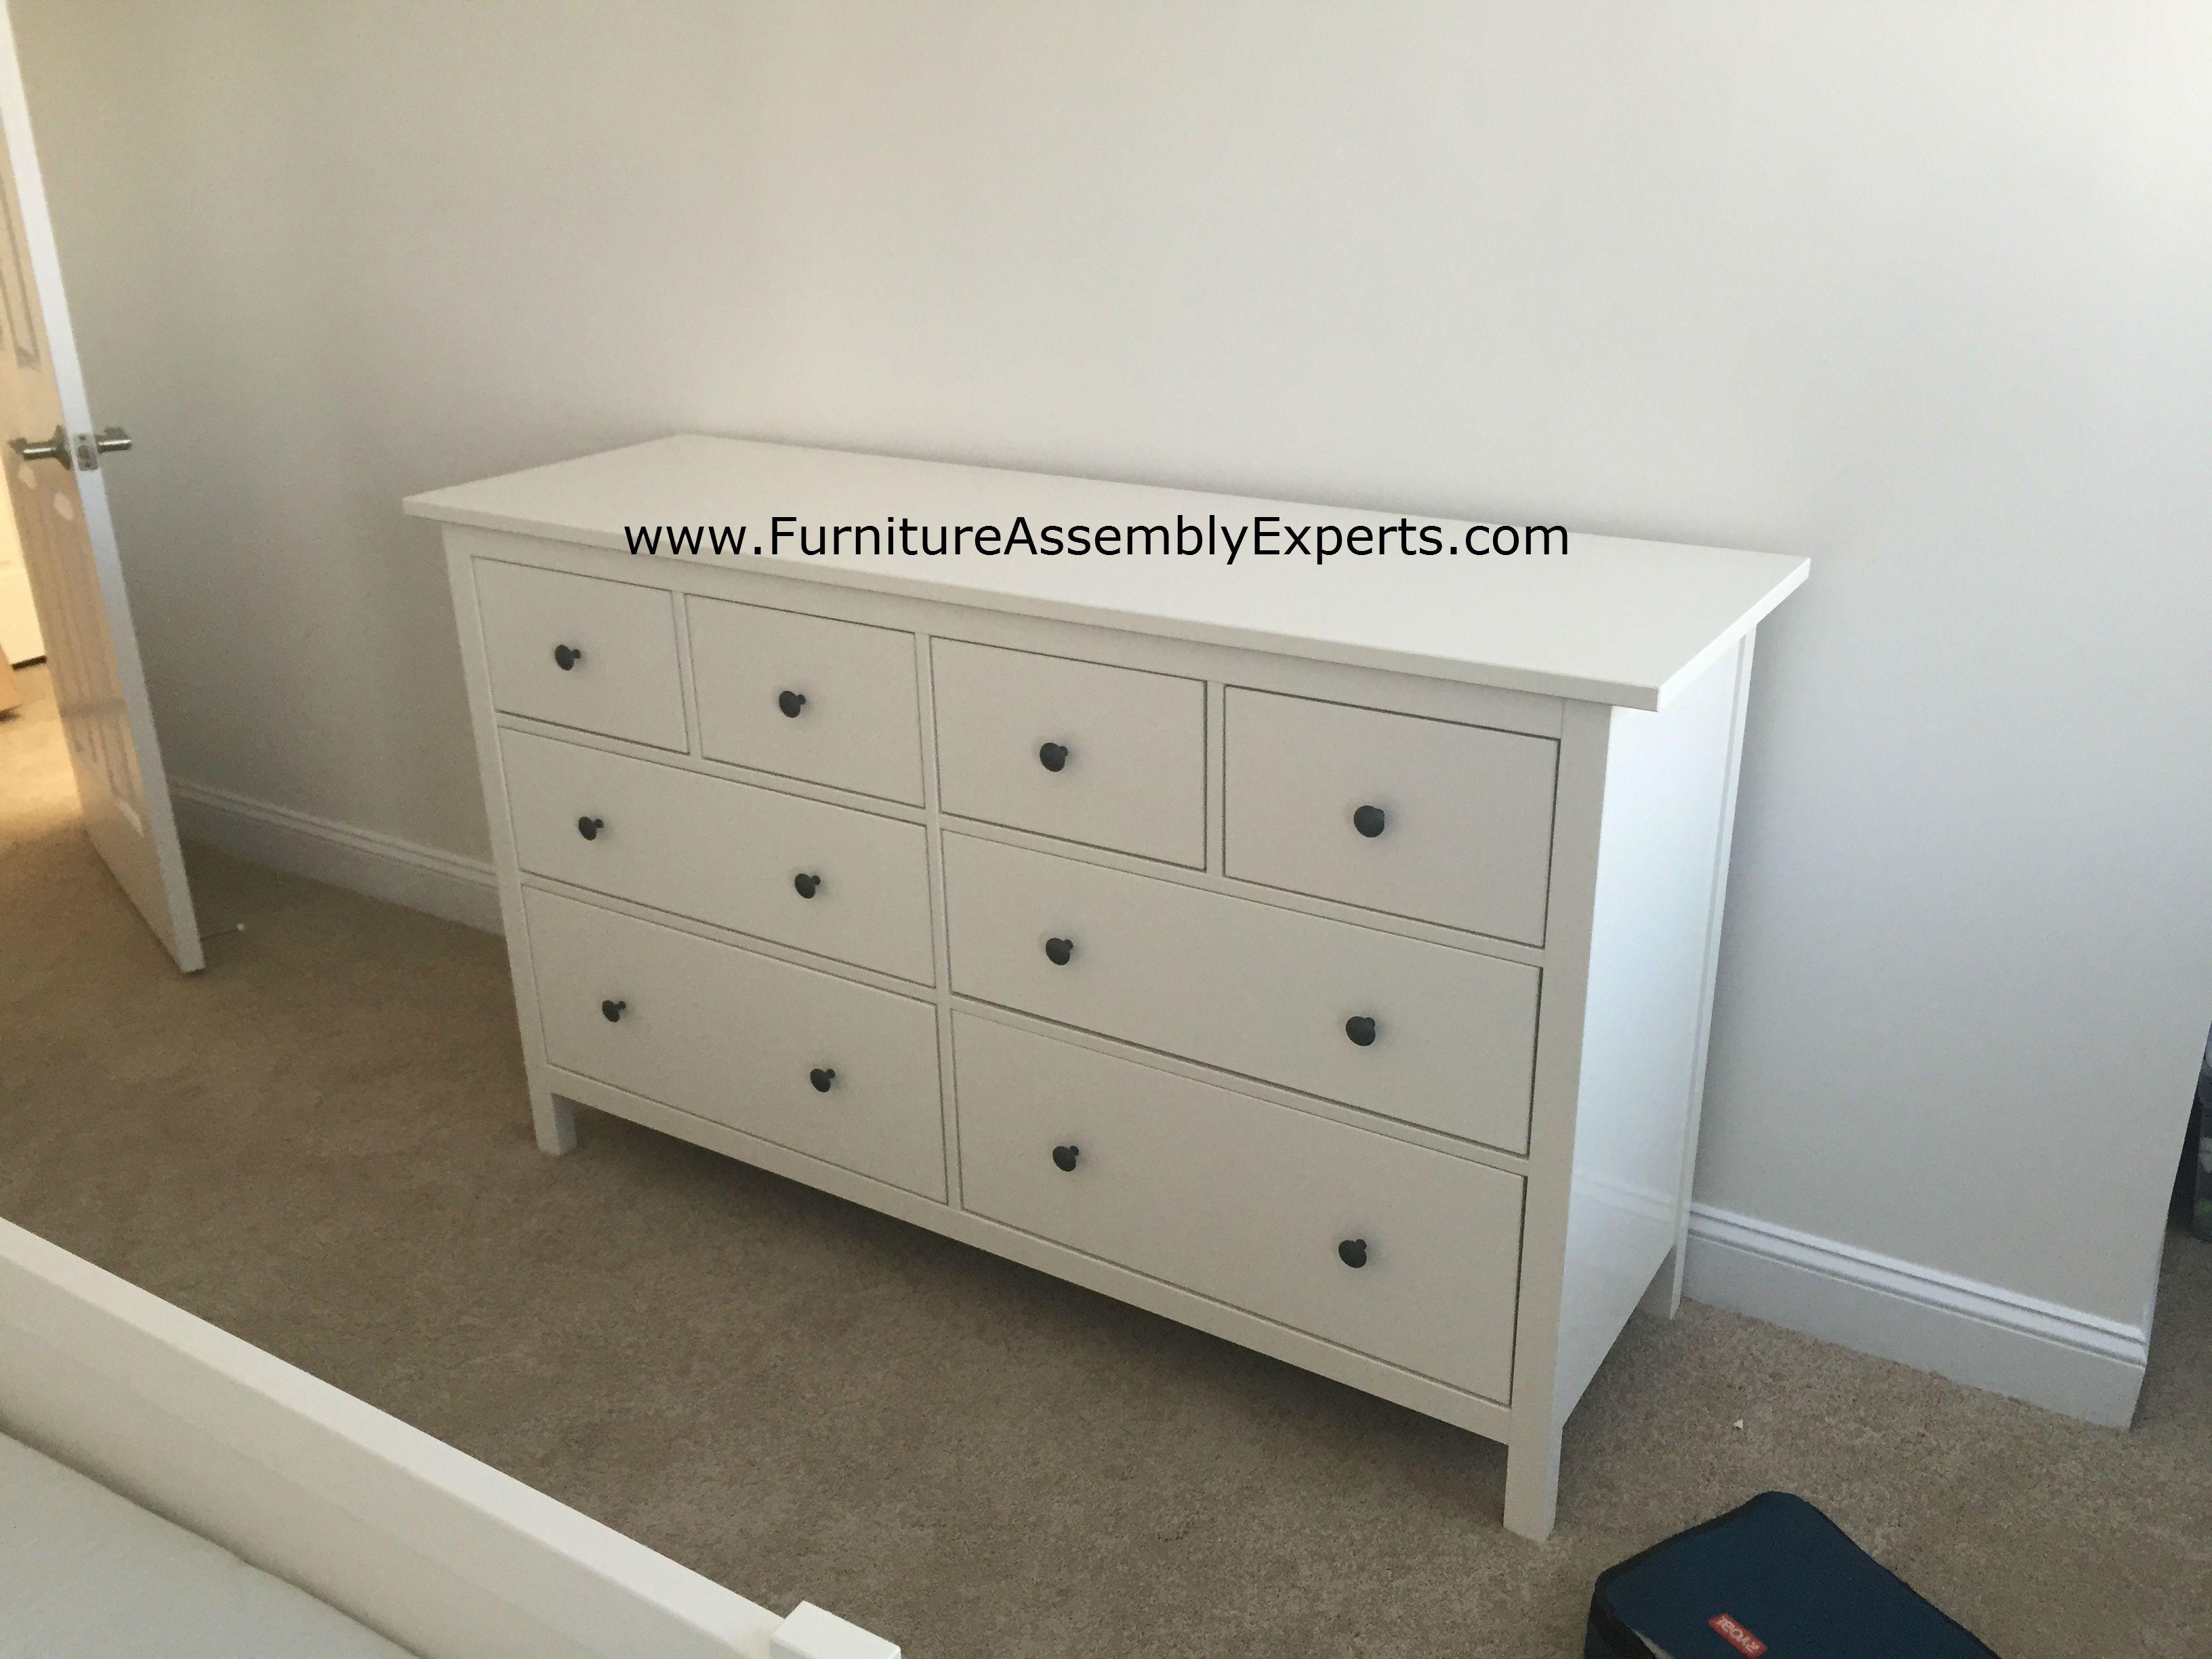 Ikea Hemnes Dresser Assembled In Detroit Mi By Furniture